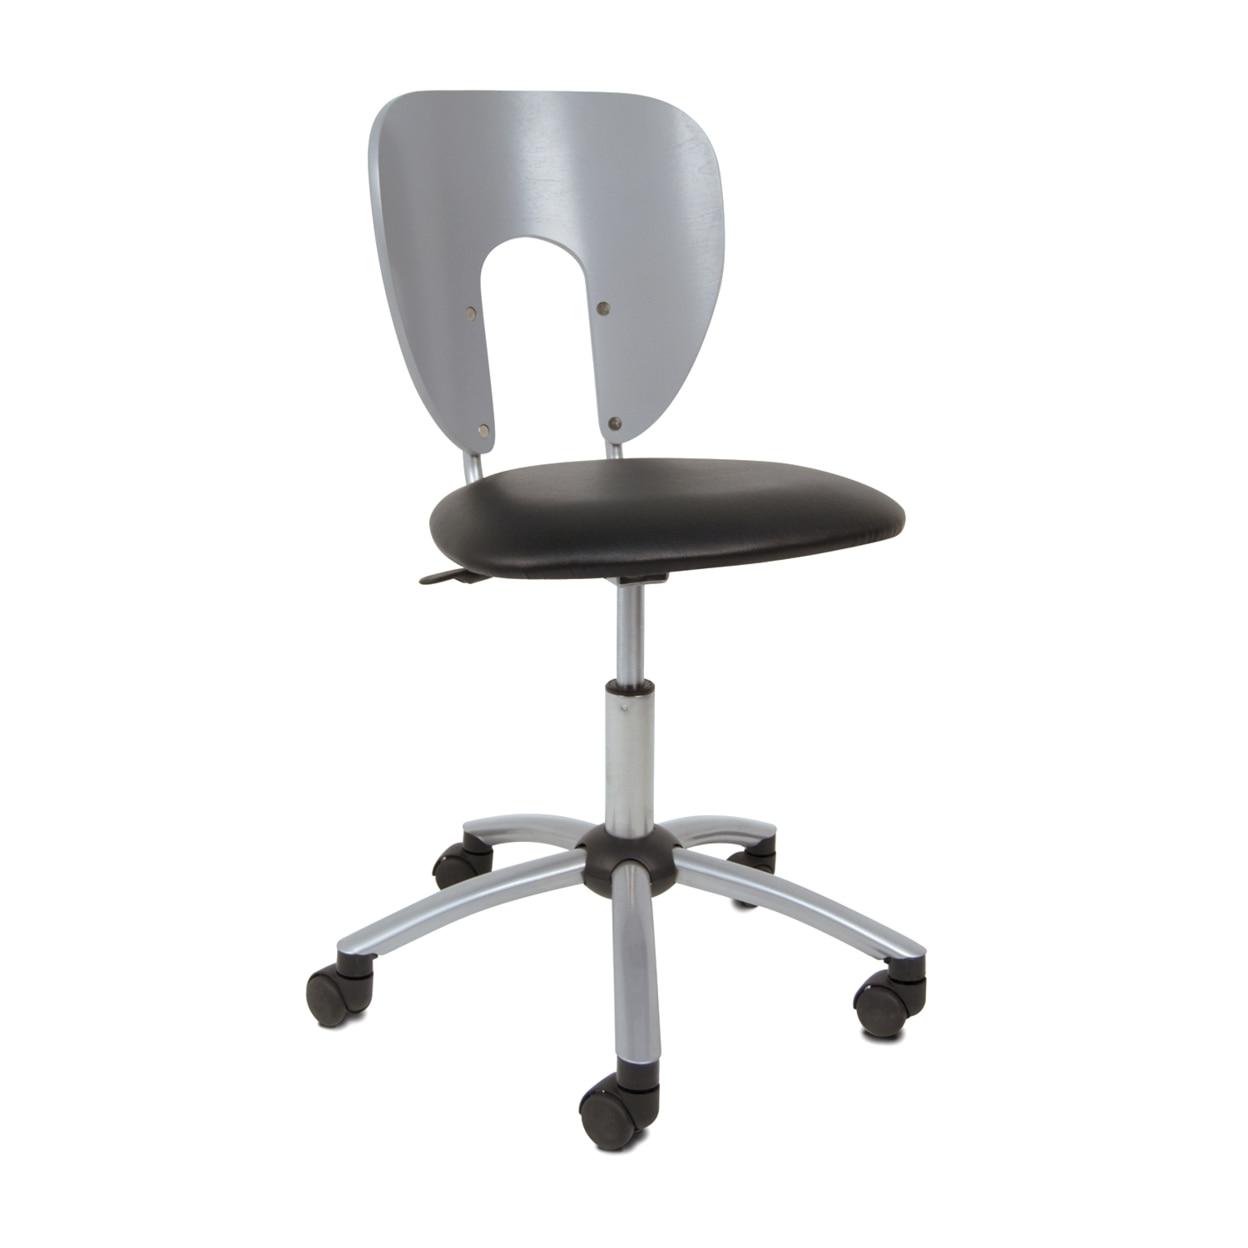 Studio Designs Home Office Futura Chair - Silver the silver chair